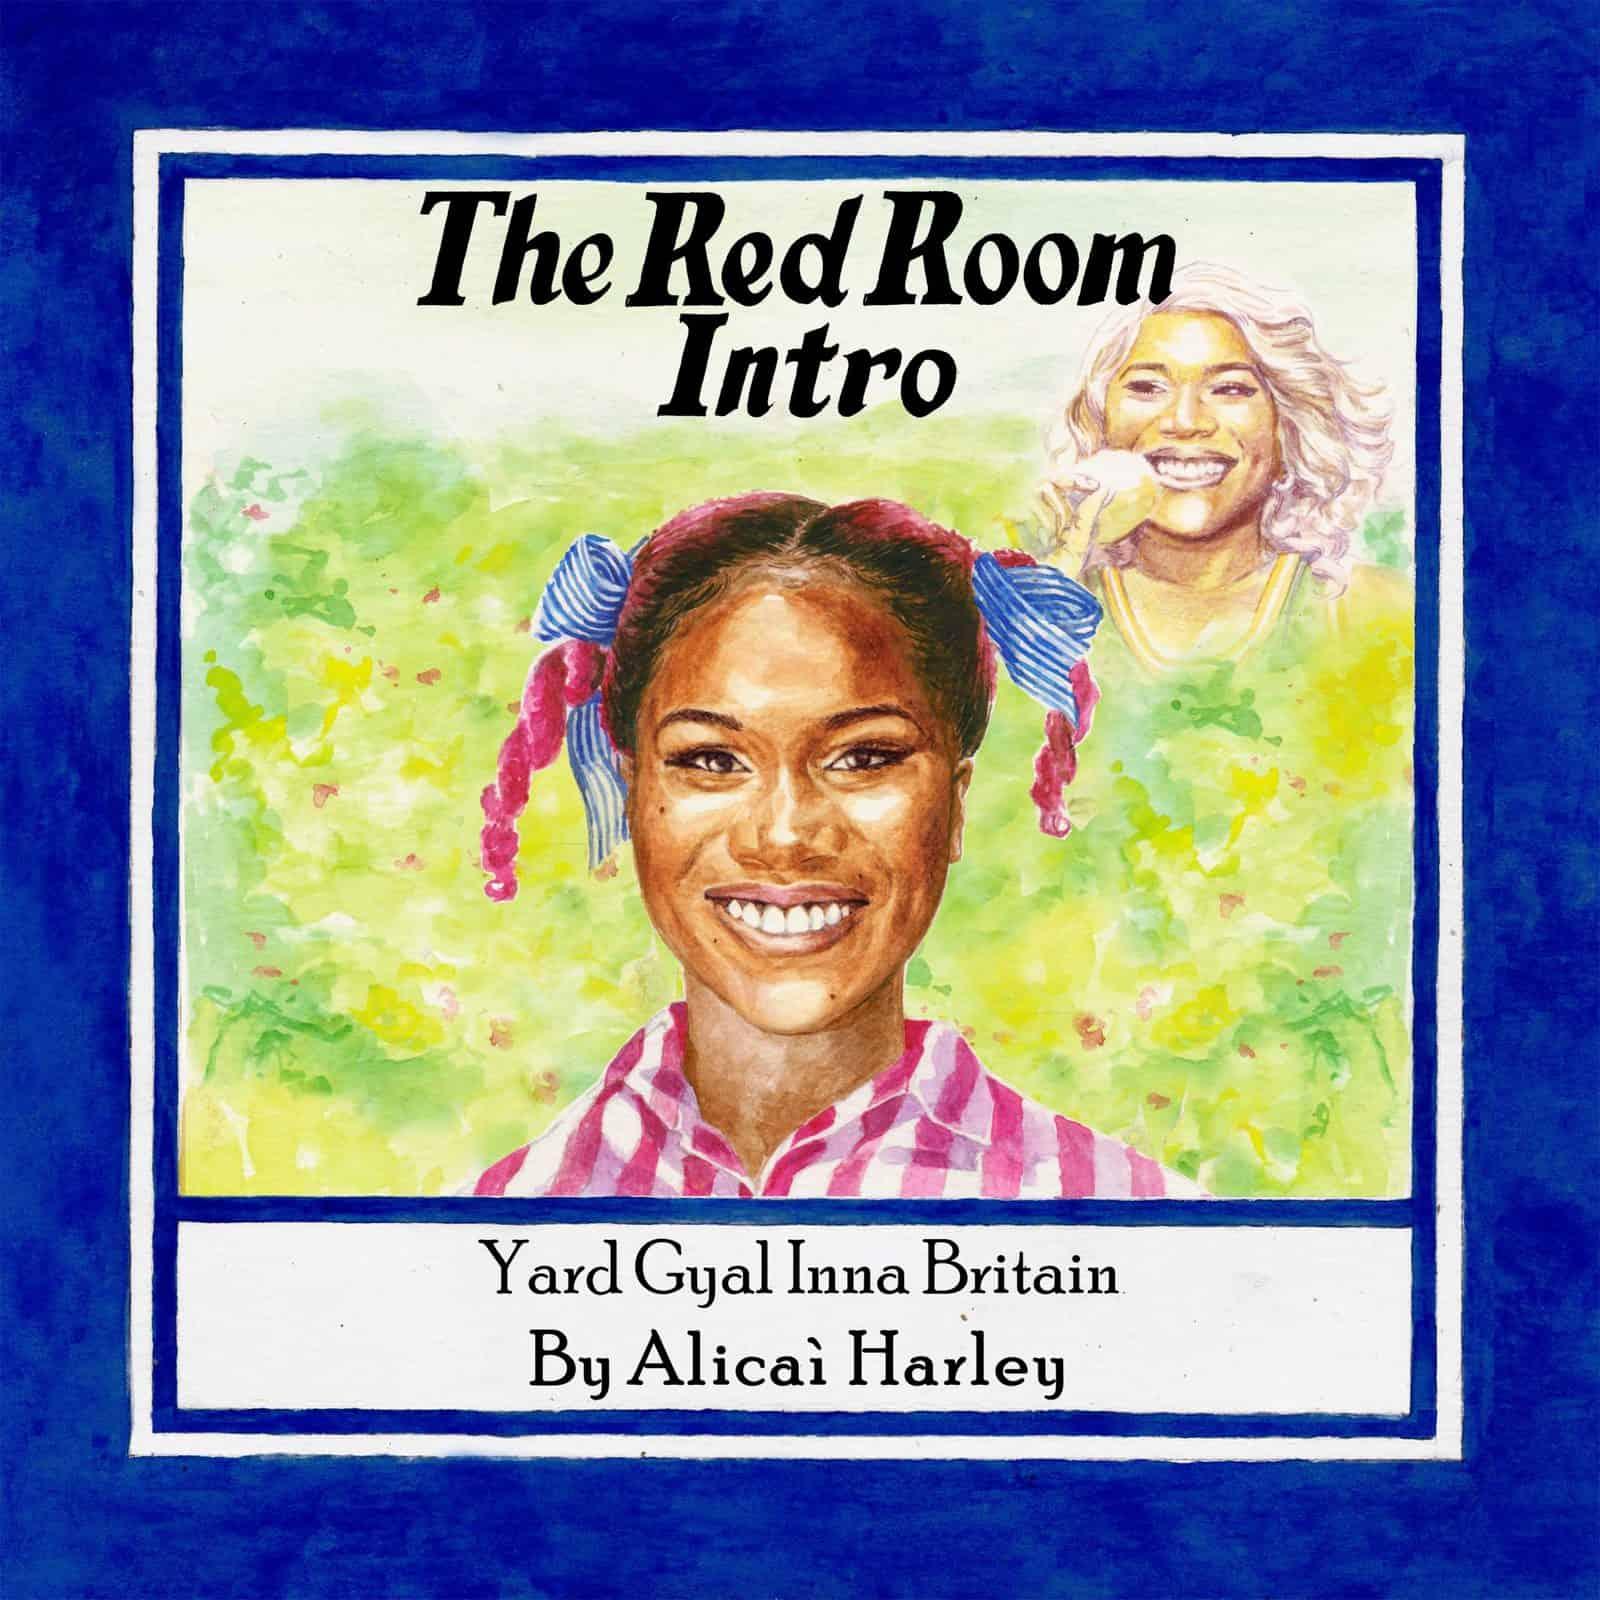 Alicai Harley - The Red Room Intro (Yard Gyal Inna Britain)